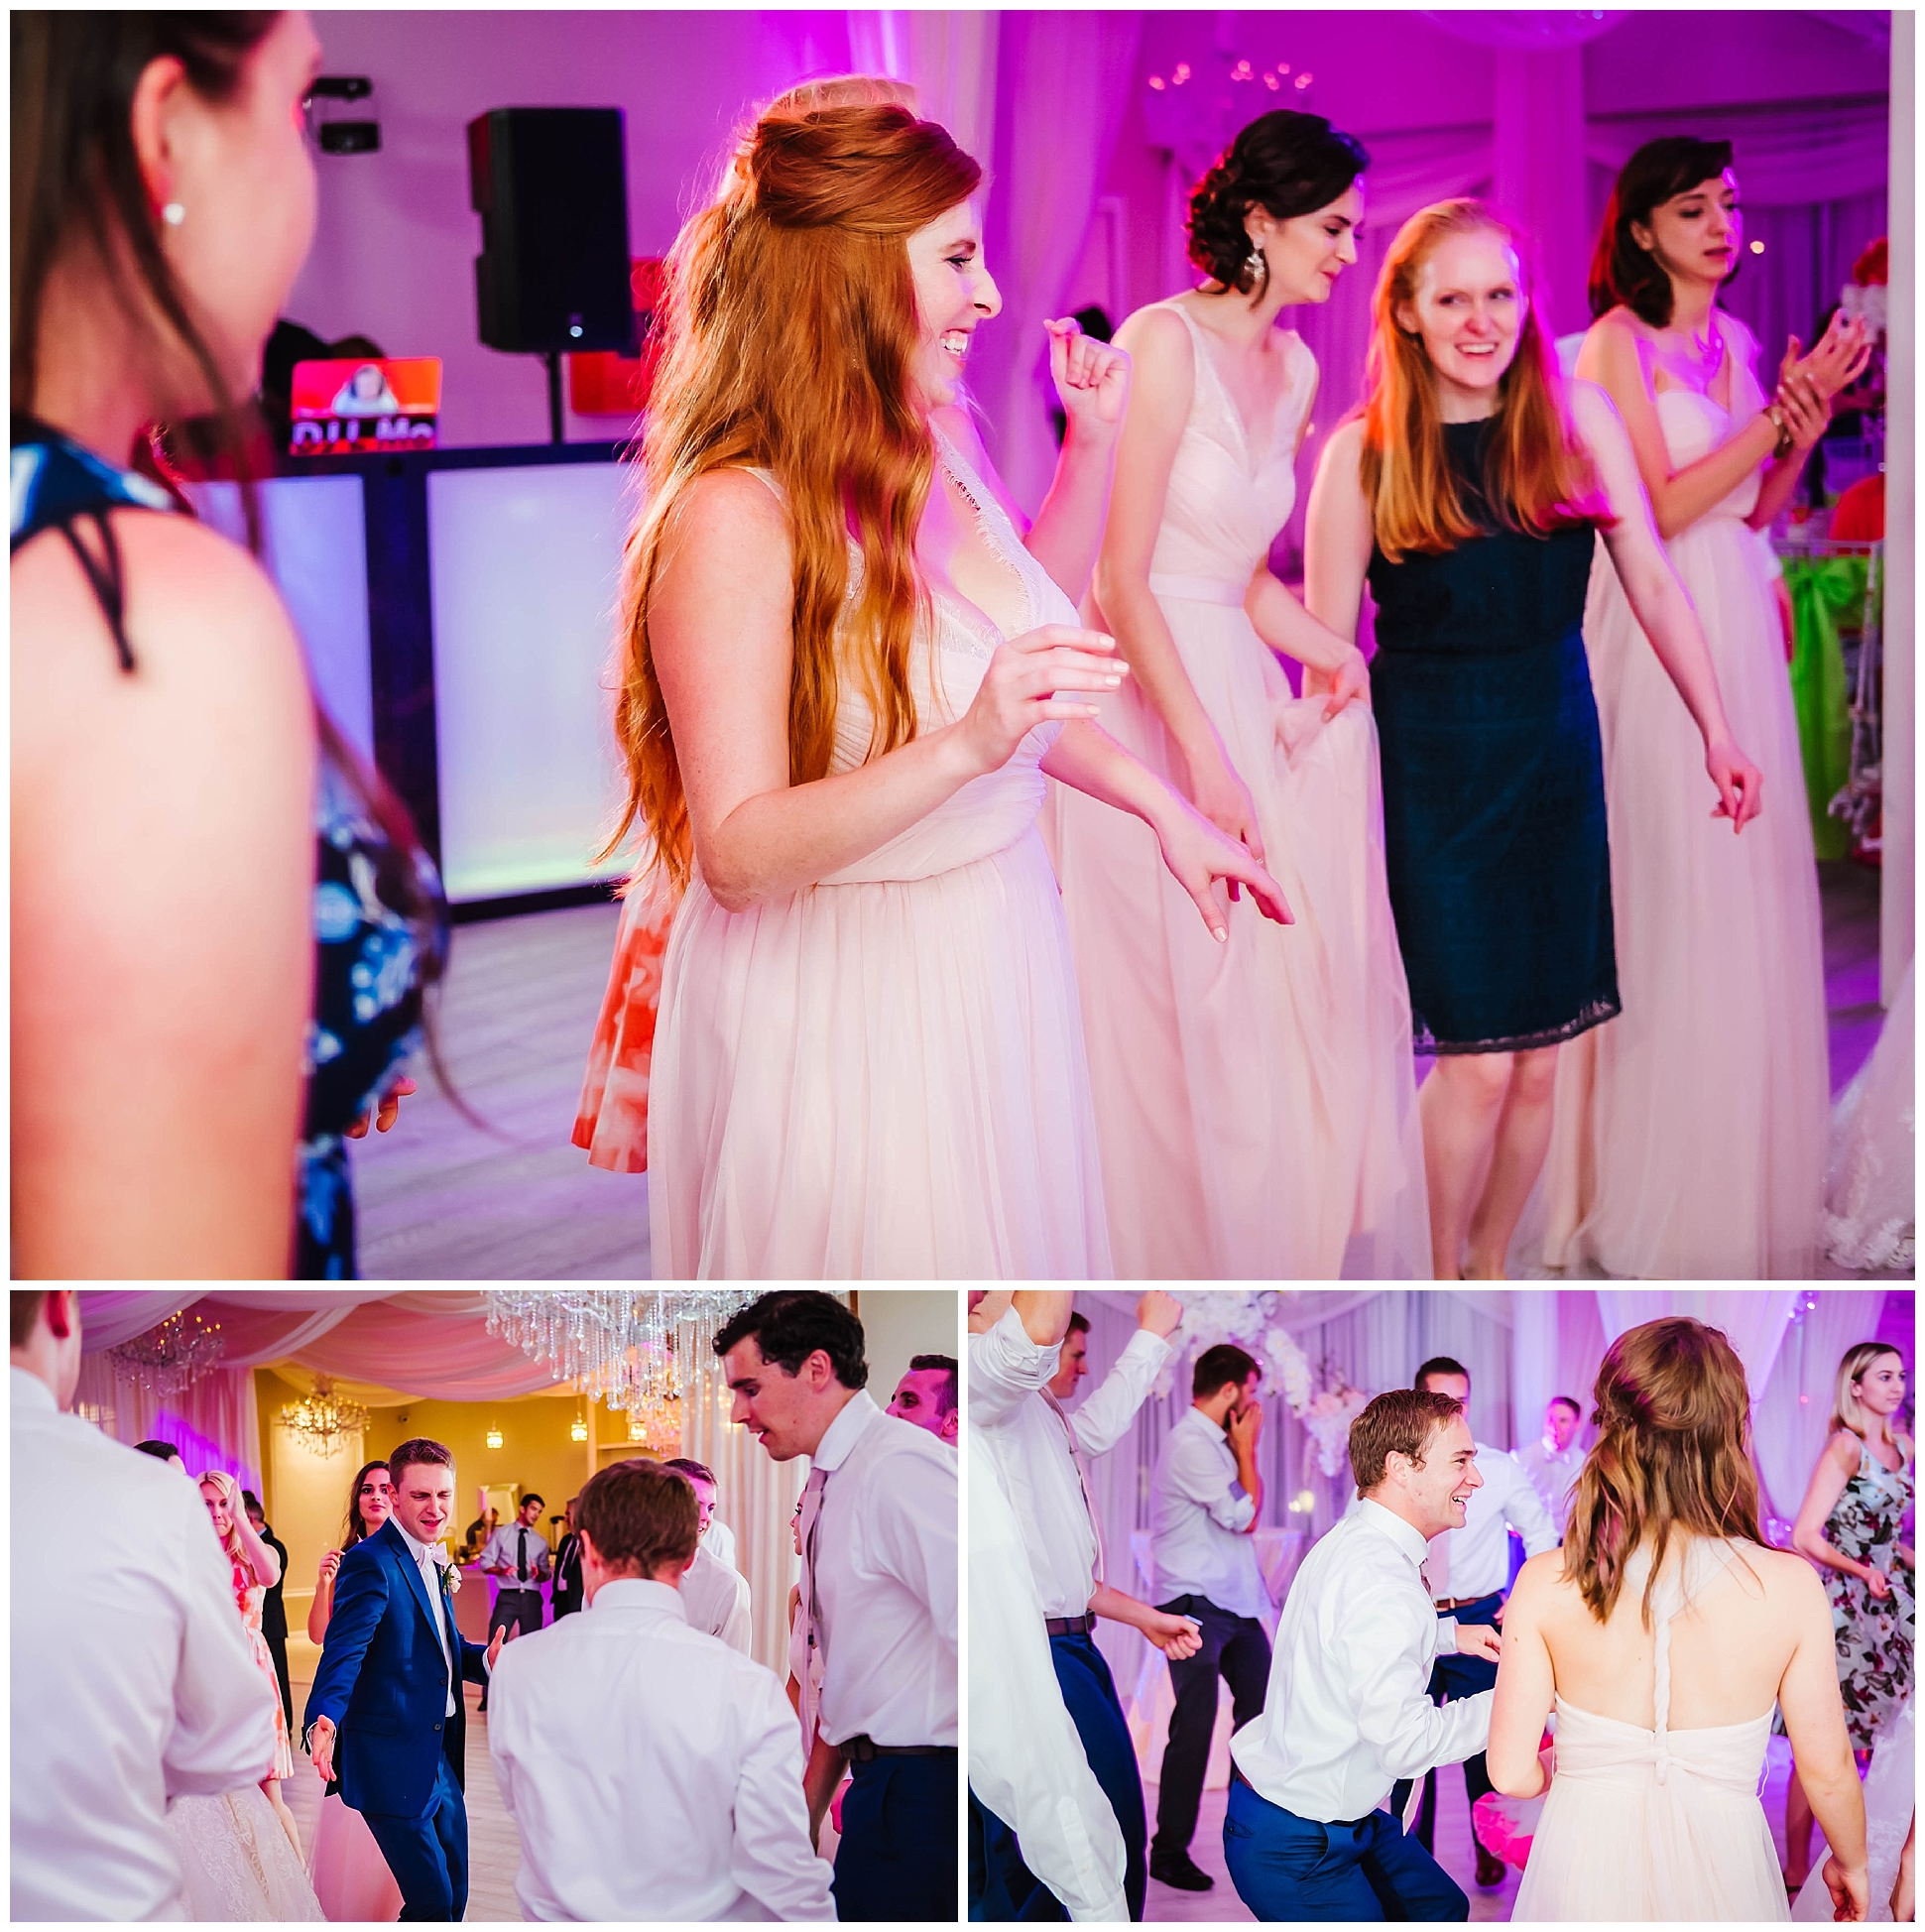 st-pete-wedding-photographer-sunken-gardens-crystal-ballroom-princess-dancer_0196.jpg